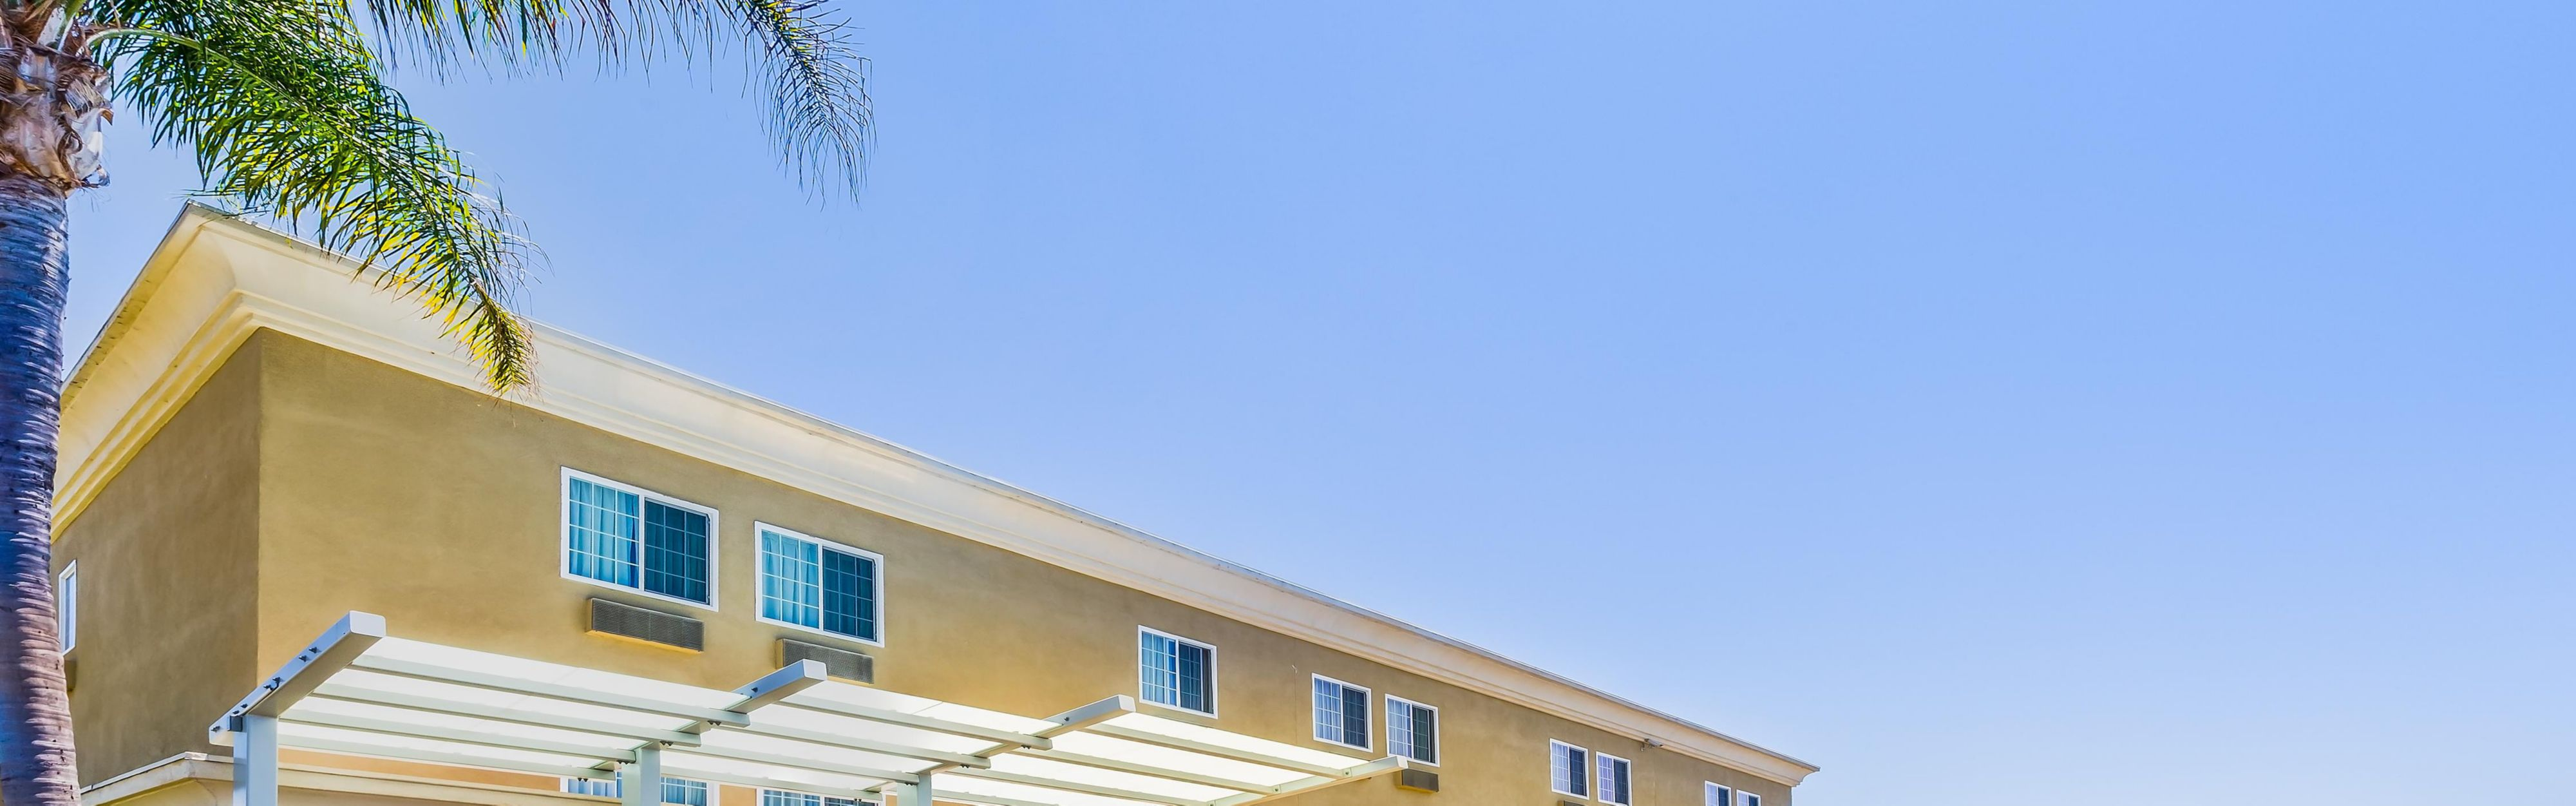 Holiday Inn Express San Diego SeaWorld-Beach Area image 0